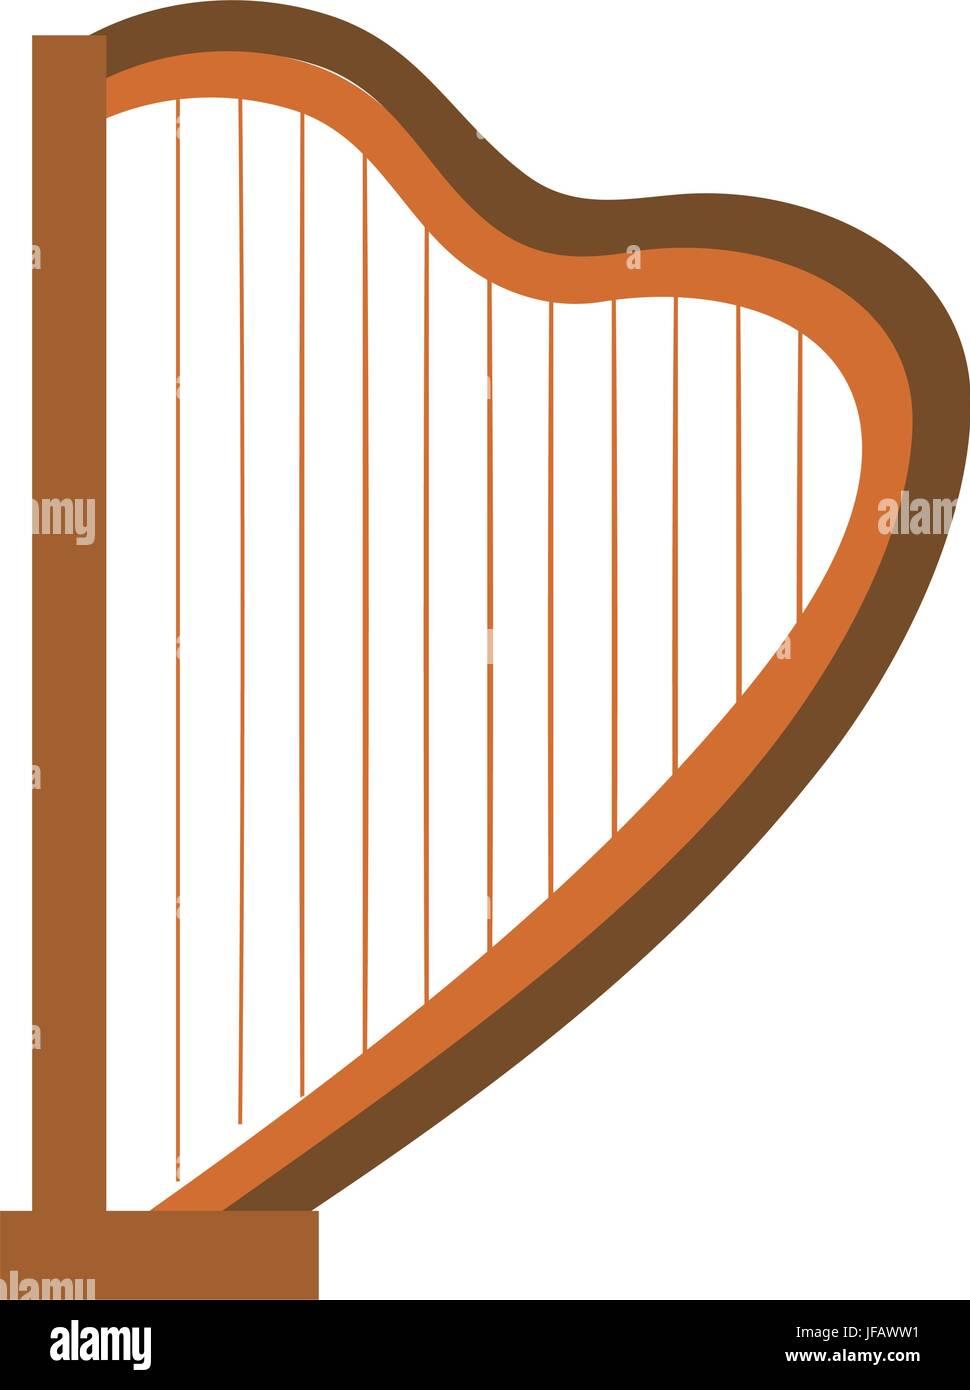 harp musical instrument icon vector illustration design - Stock Vector